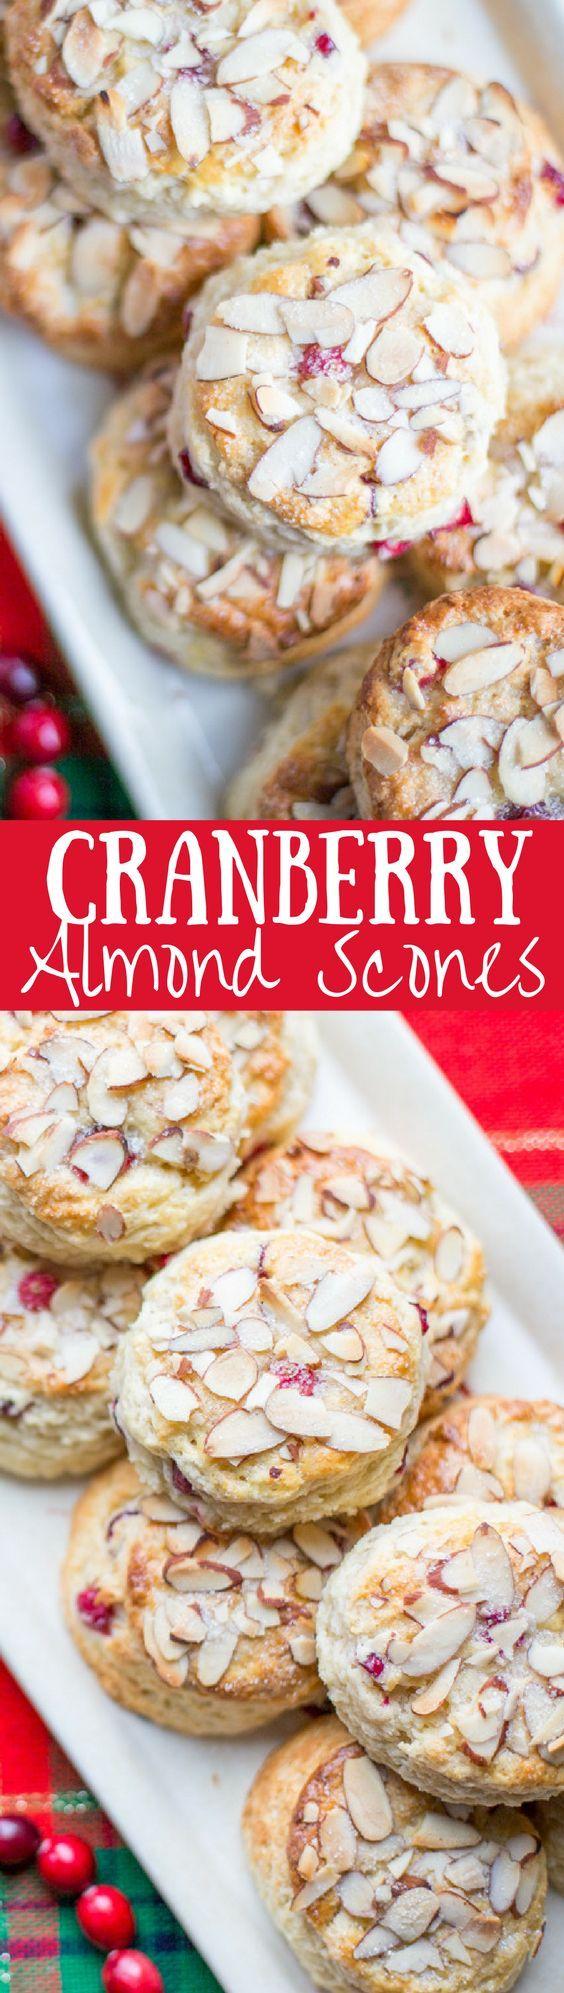 Cranberry Almond Scones - lightly sweet with a big almond flavor | www.savingdessert...